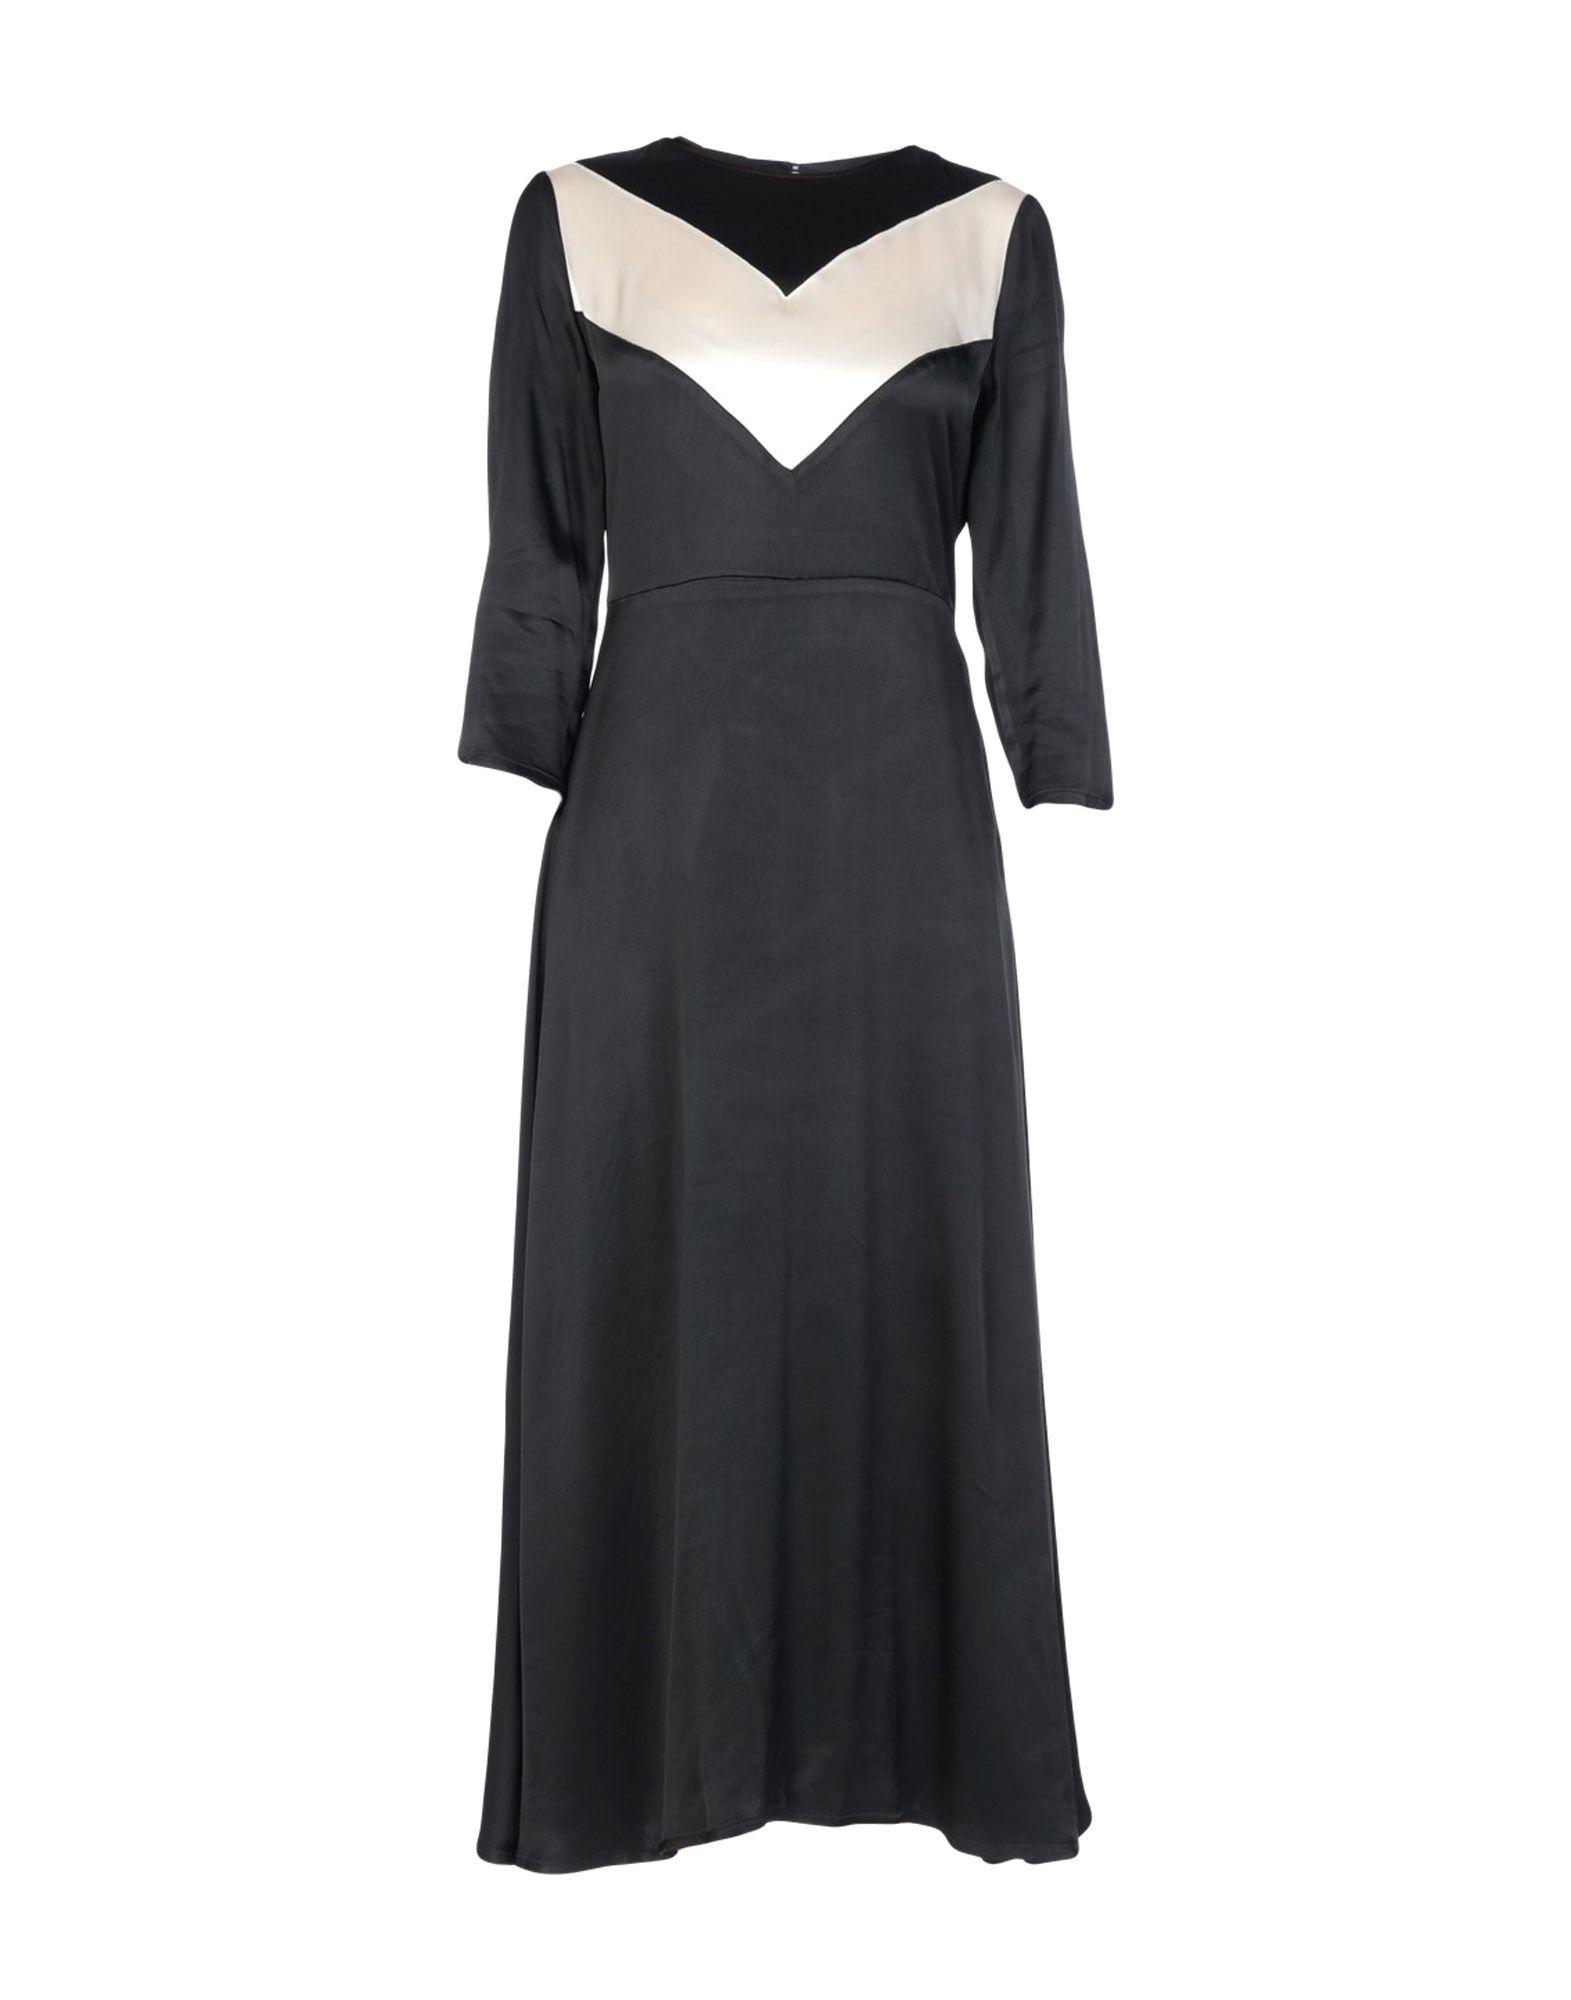 SOALLURE Платье длиной 3/4 icons платье длиной 3 4